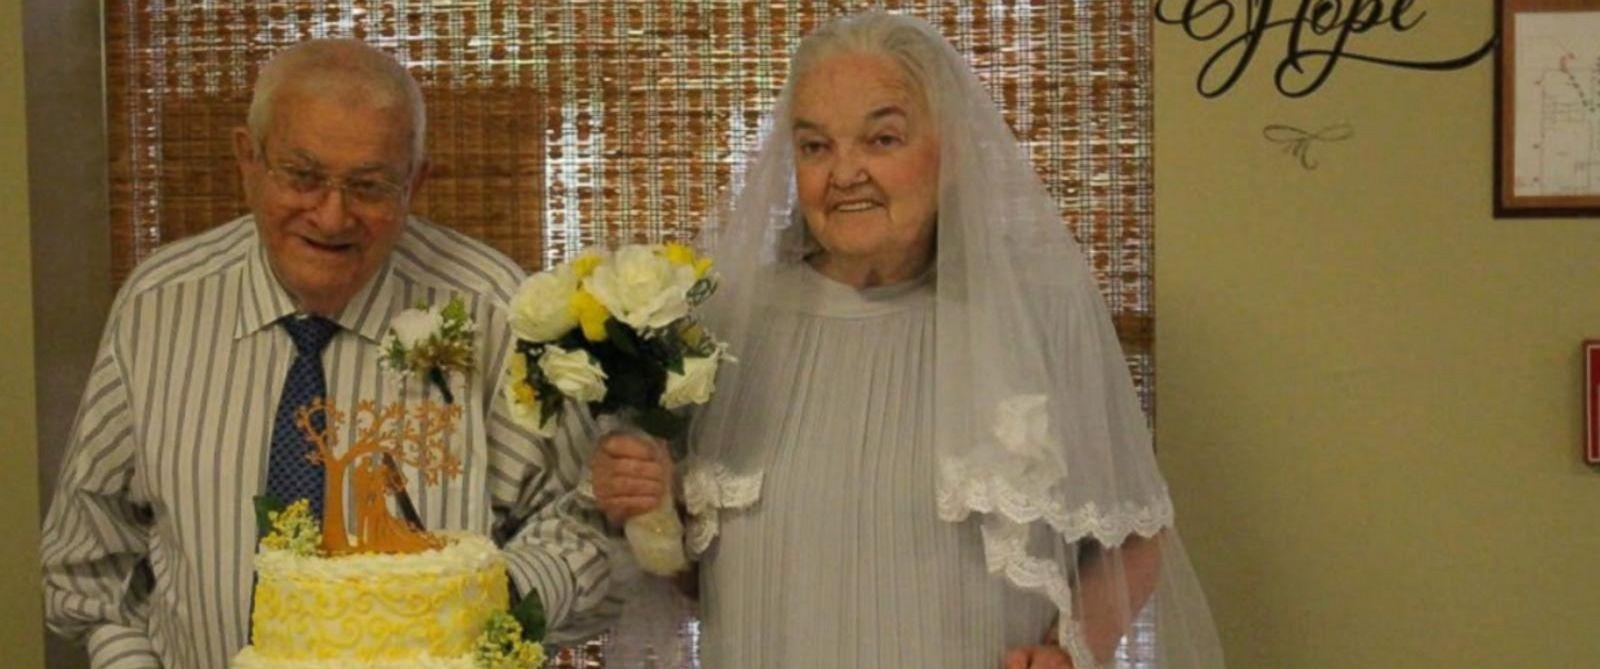 VIDEO: 9 senior citizen couples renew their vows at their senior care center